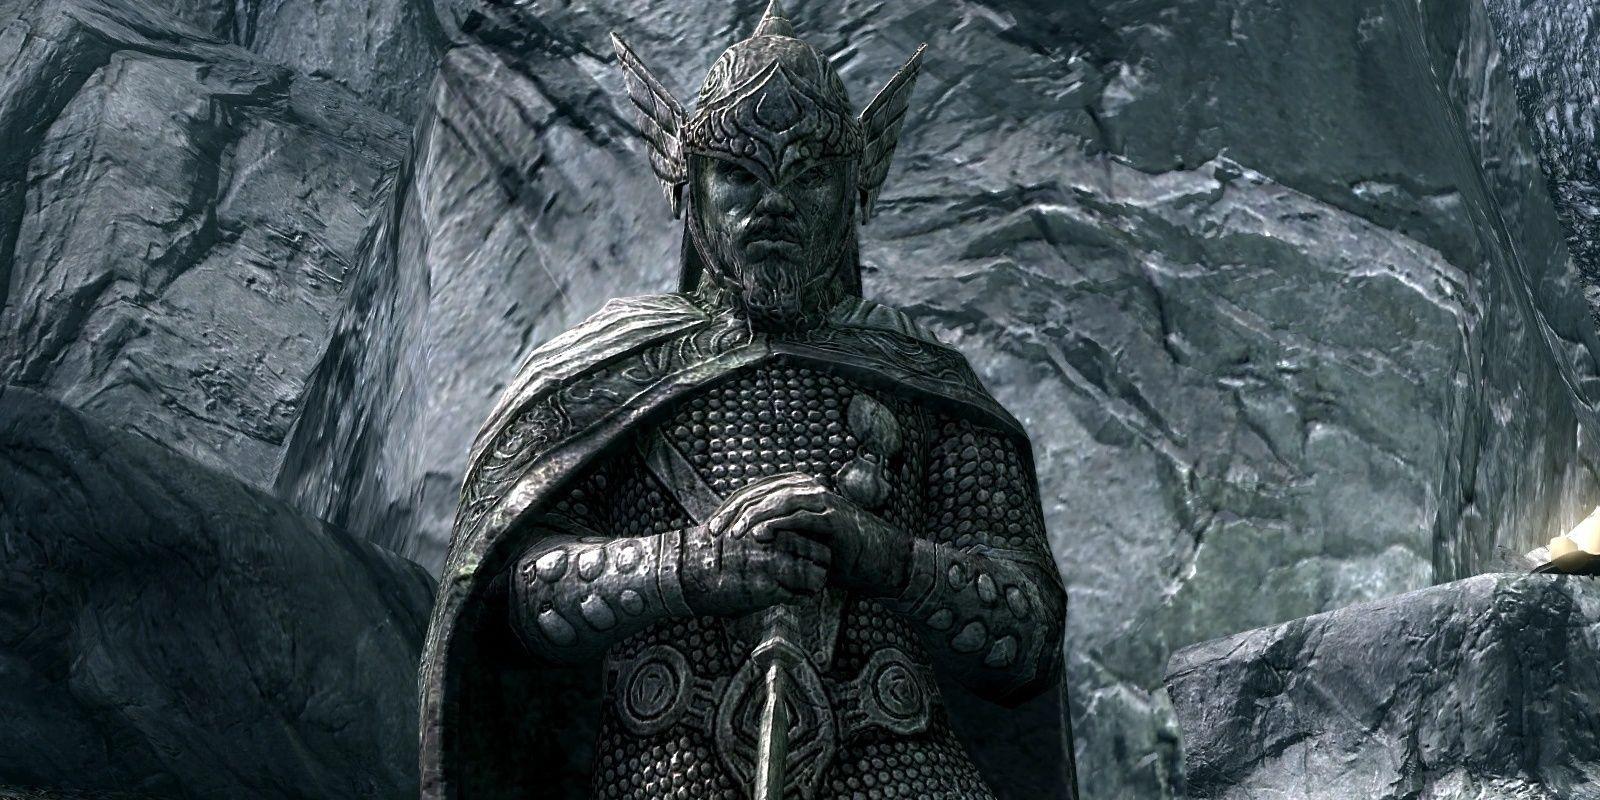 Starfield's The Elder Scrolls 6 Teaser Might Hint at a Huge Cataclysm